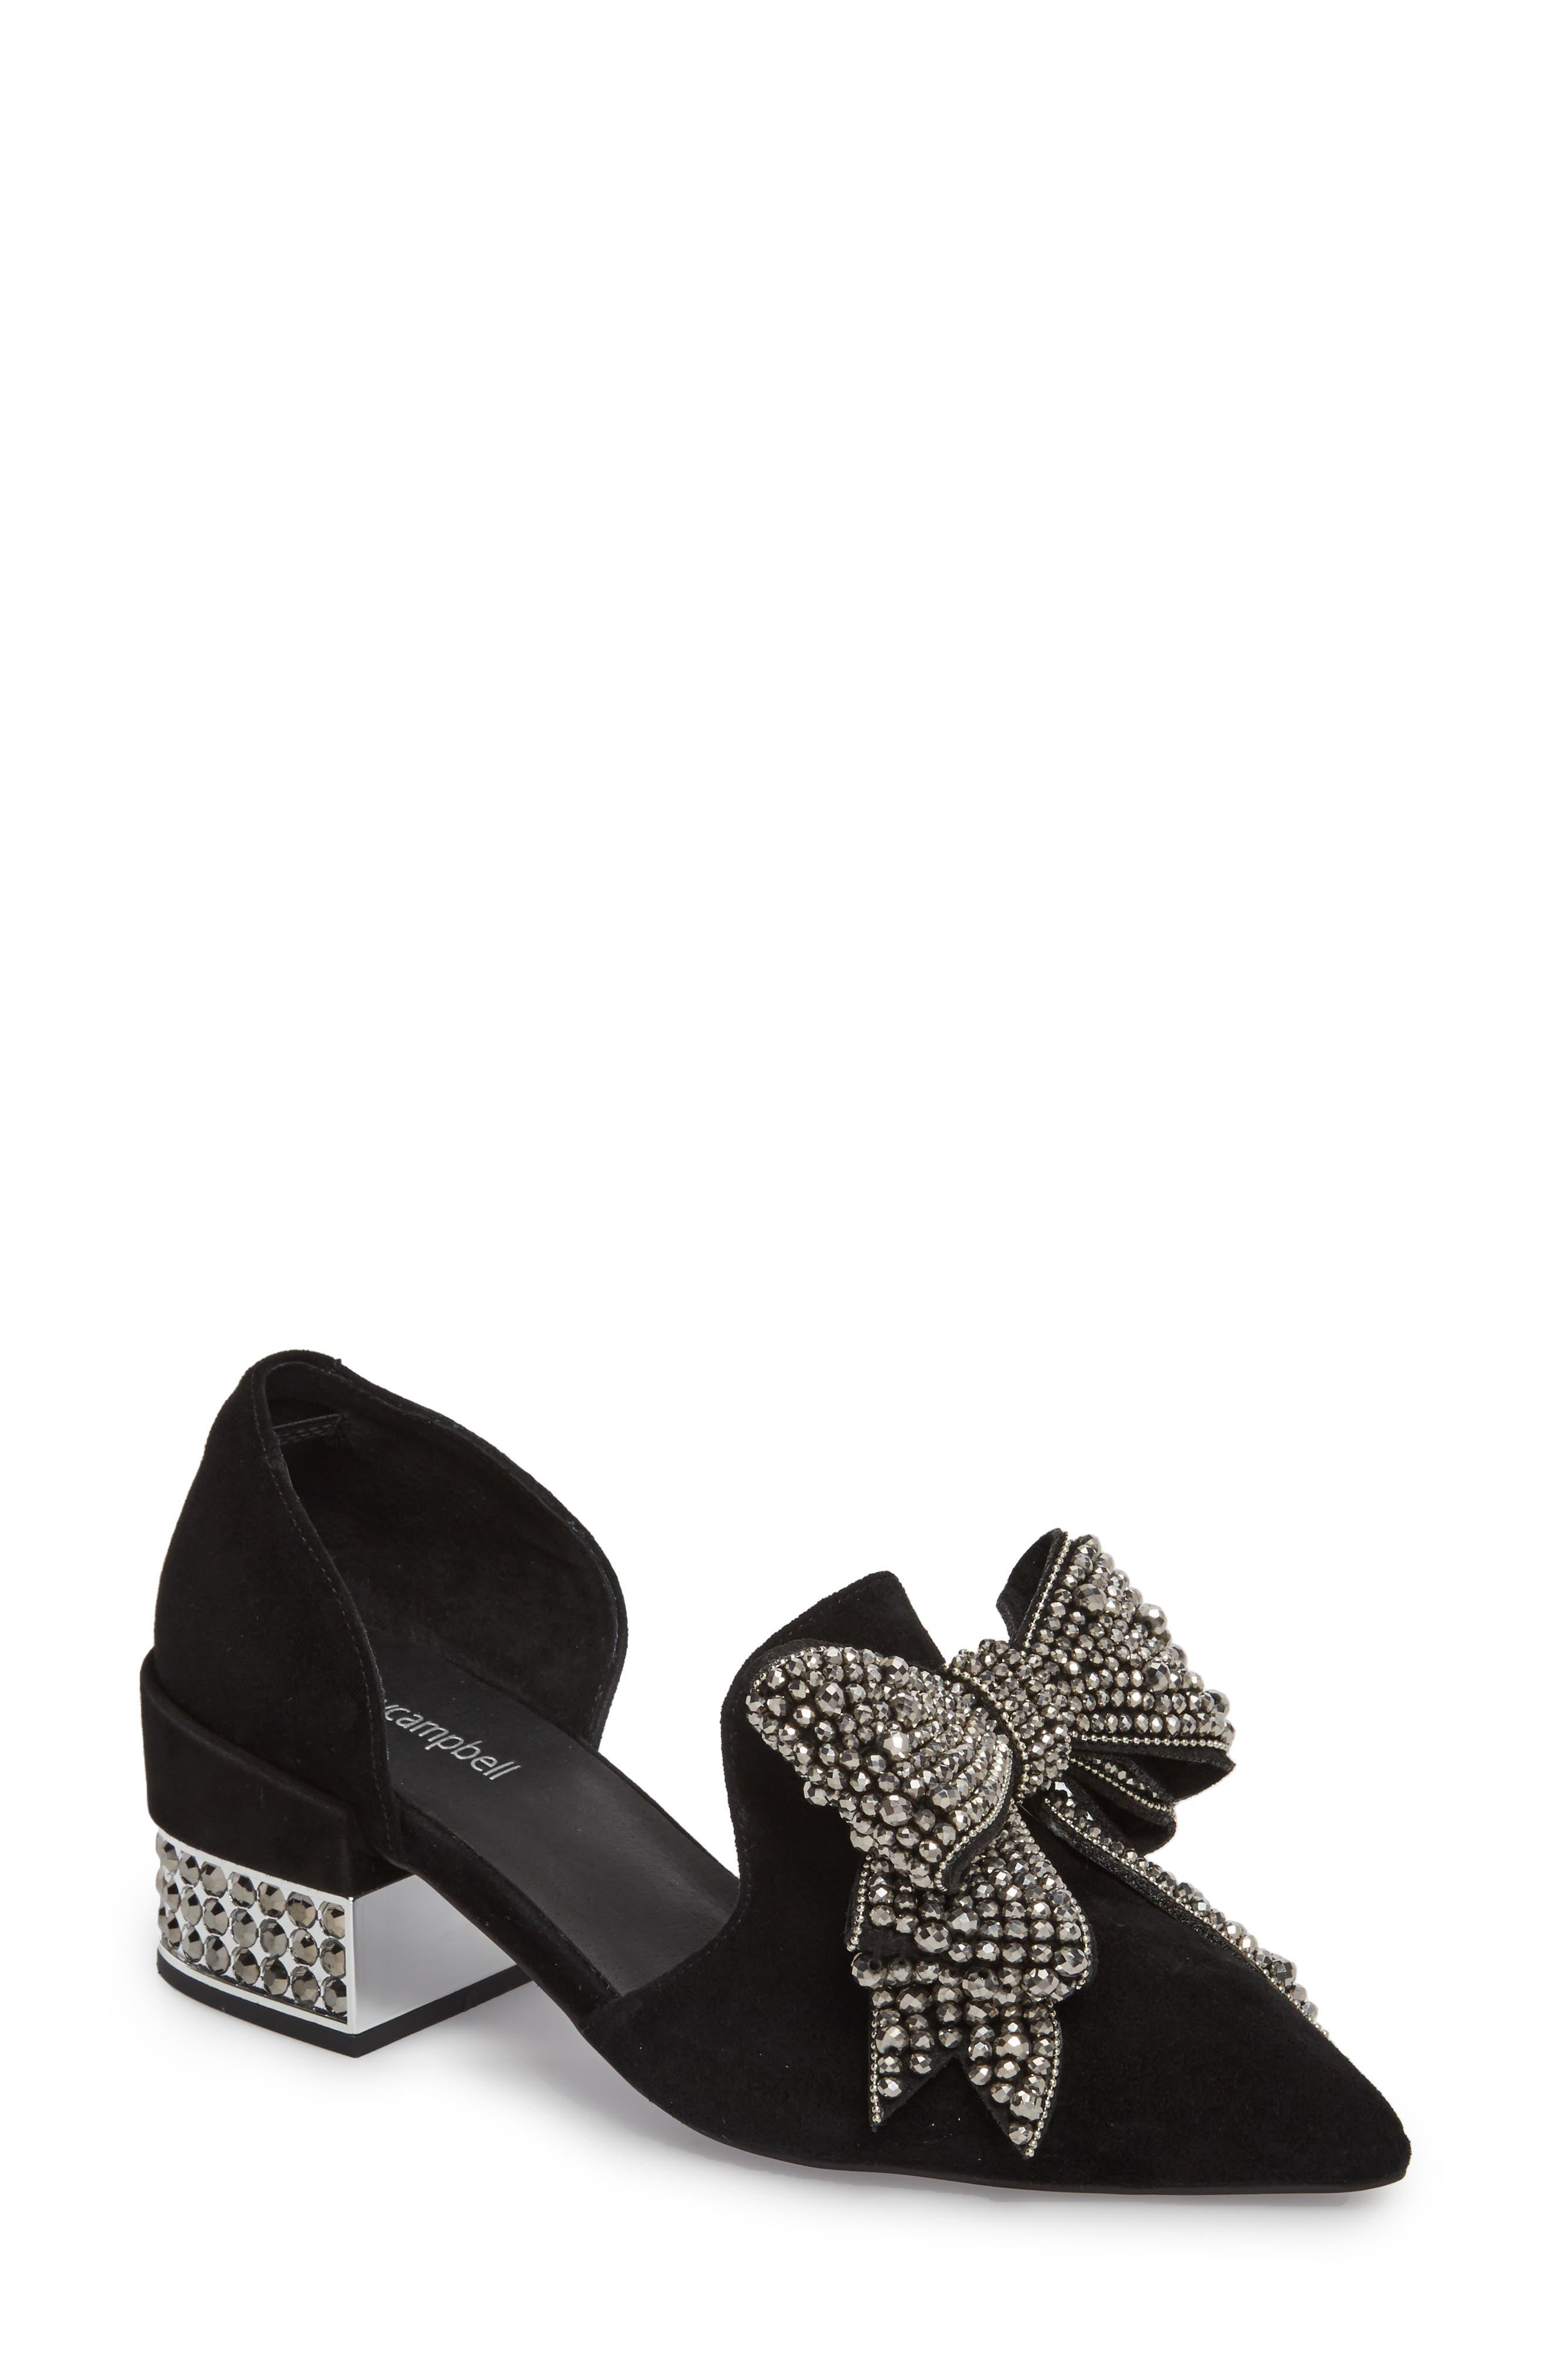 Alternate Image 1 Selected - Jeffrey Campbell Valenti Embellished Bow Loafer (Women)